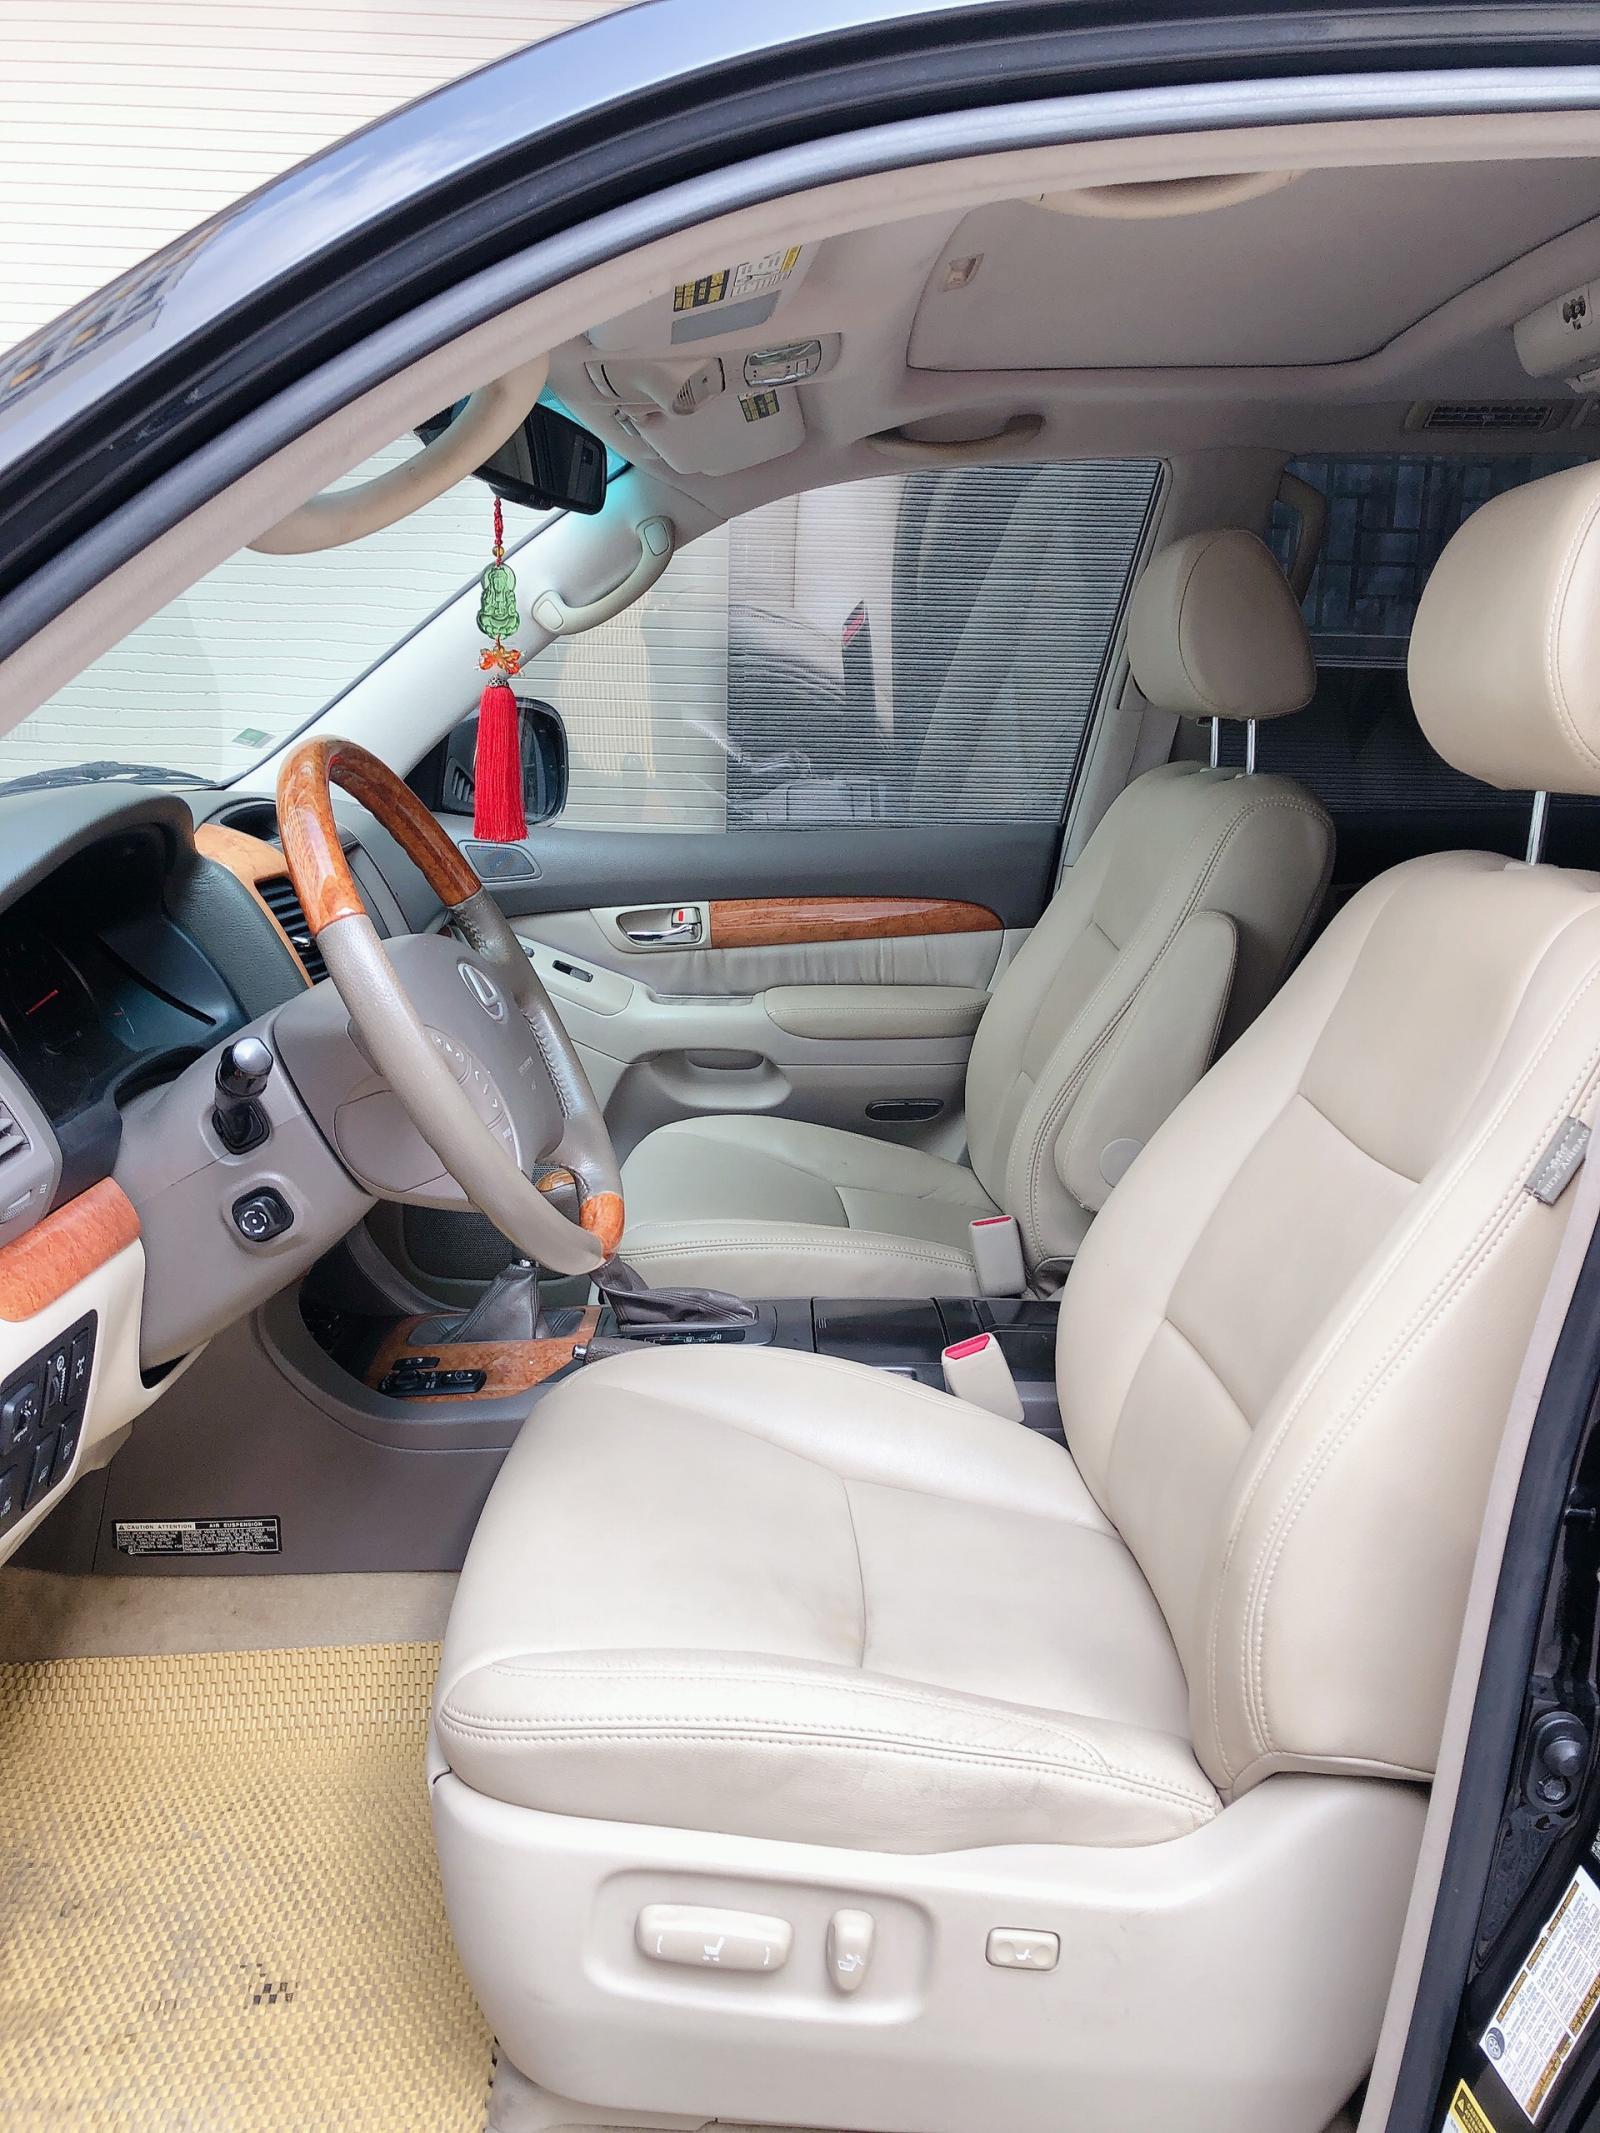 Bán Lexus GX 470 Mode 2008 zin nhất VN, capo zin, cửa zin, cốp zin